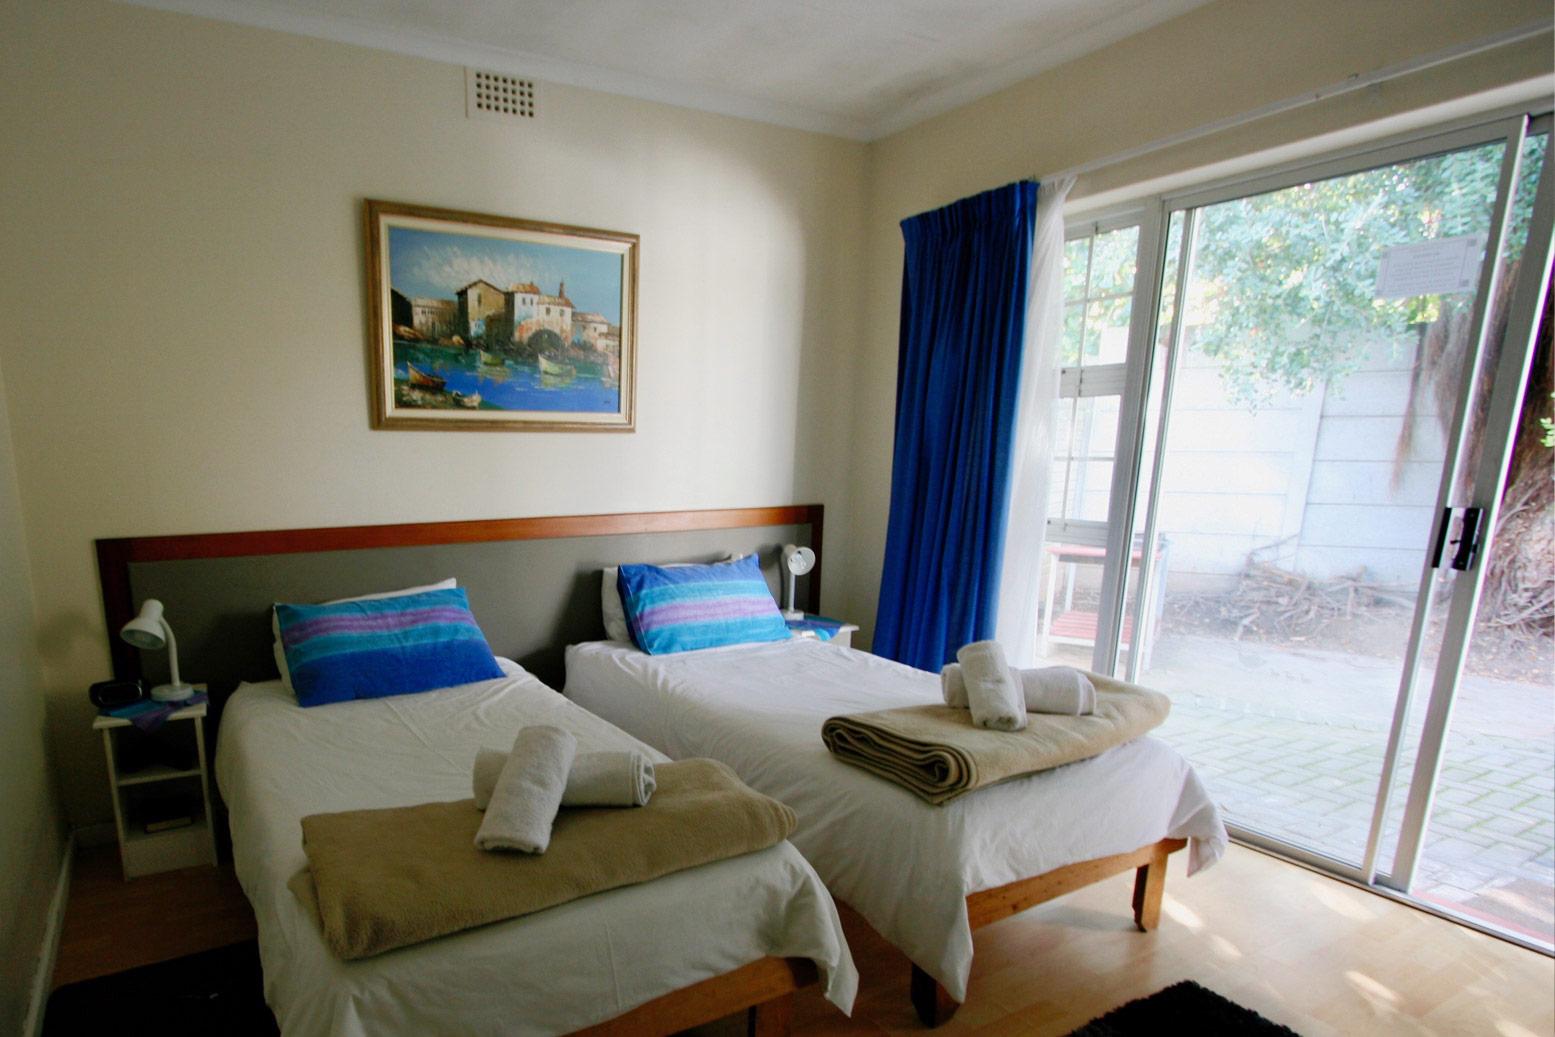 Comfortable Room with Outside Braai Area